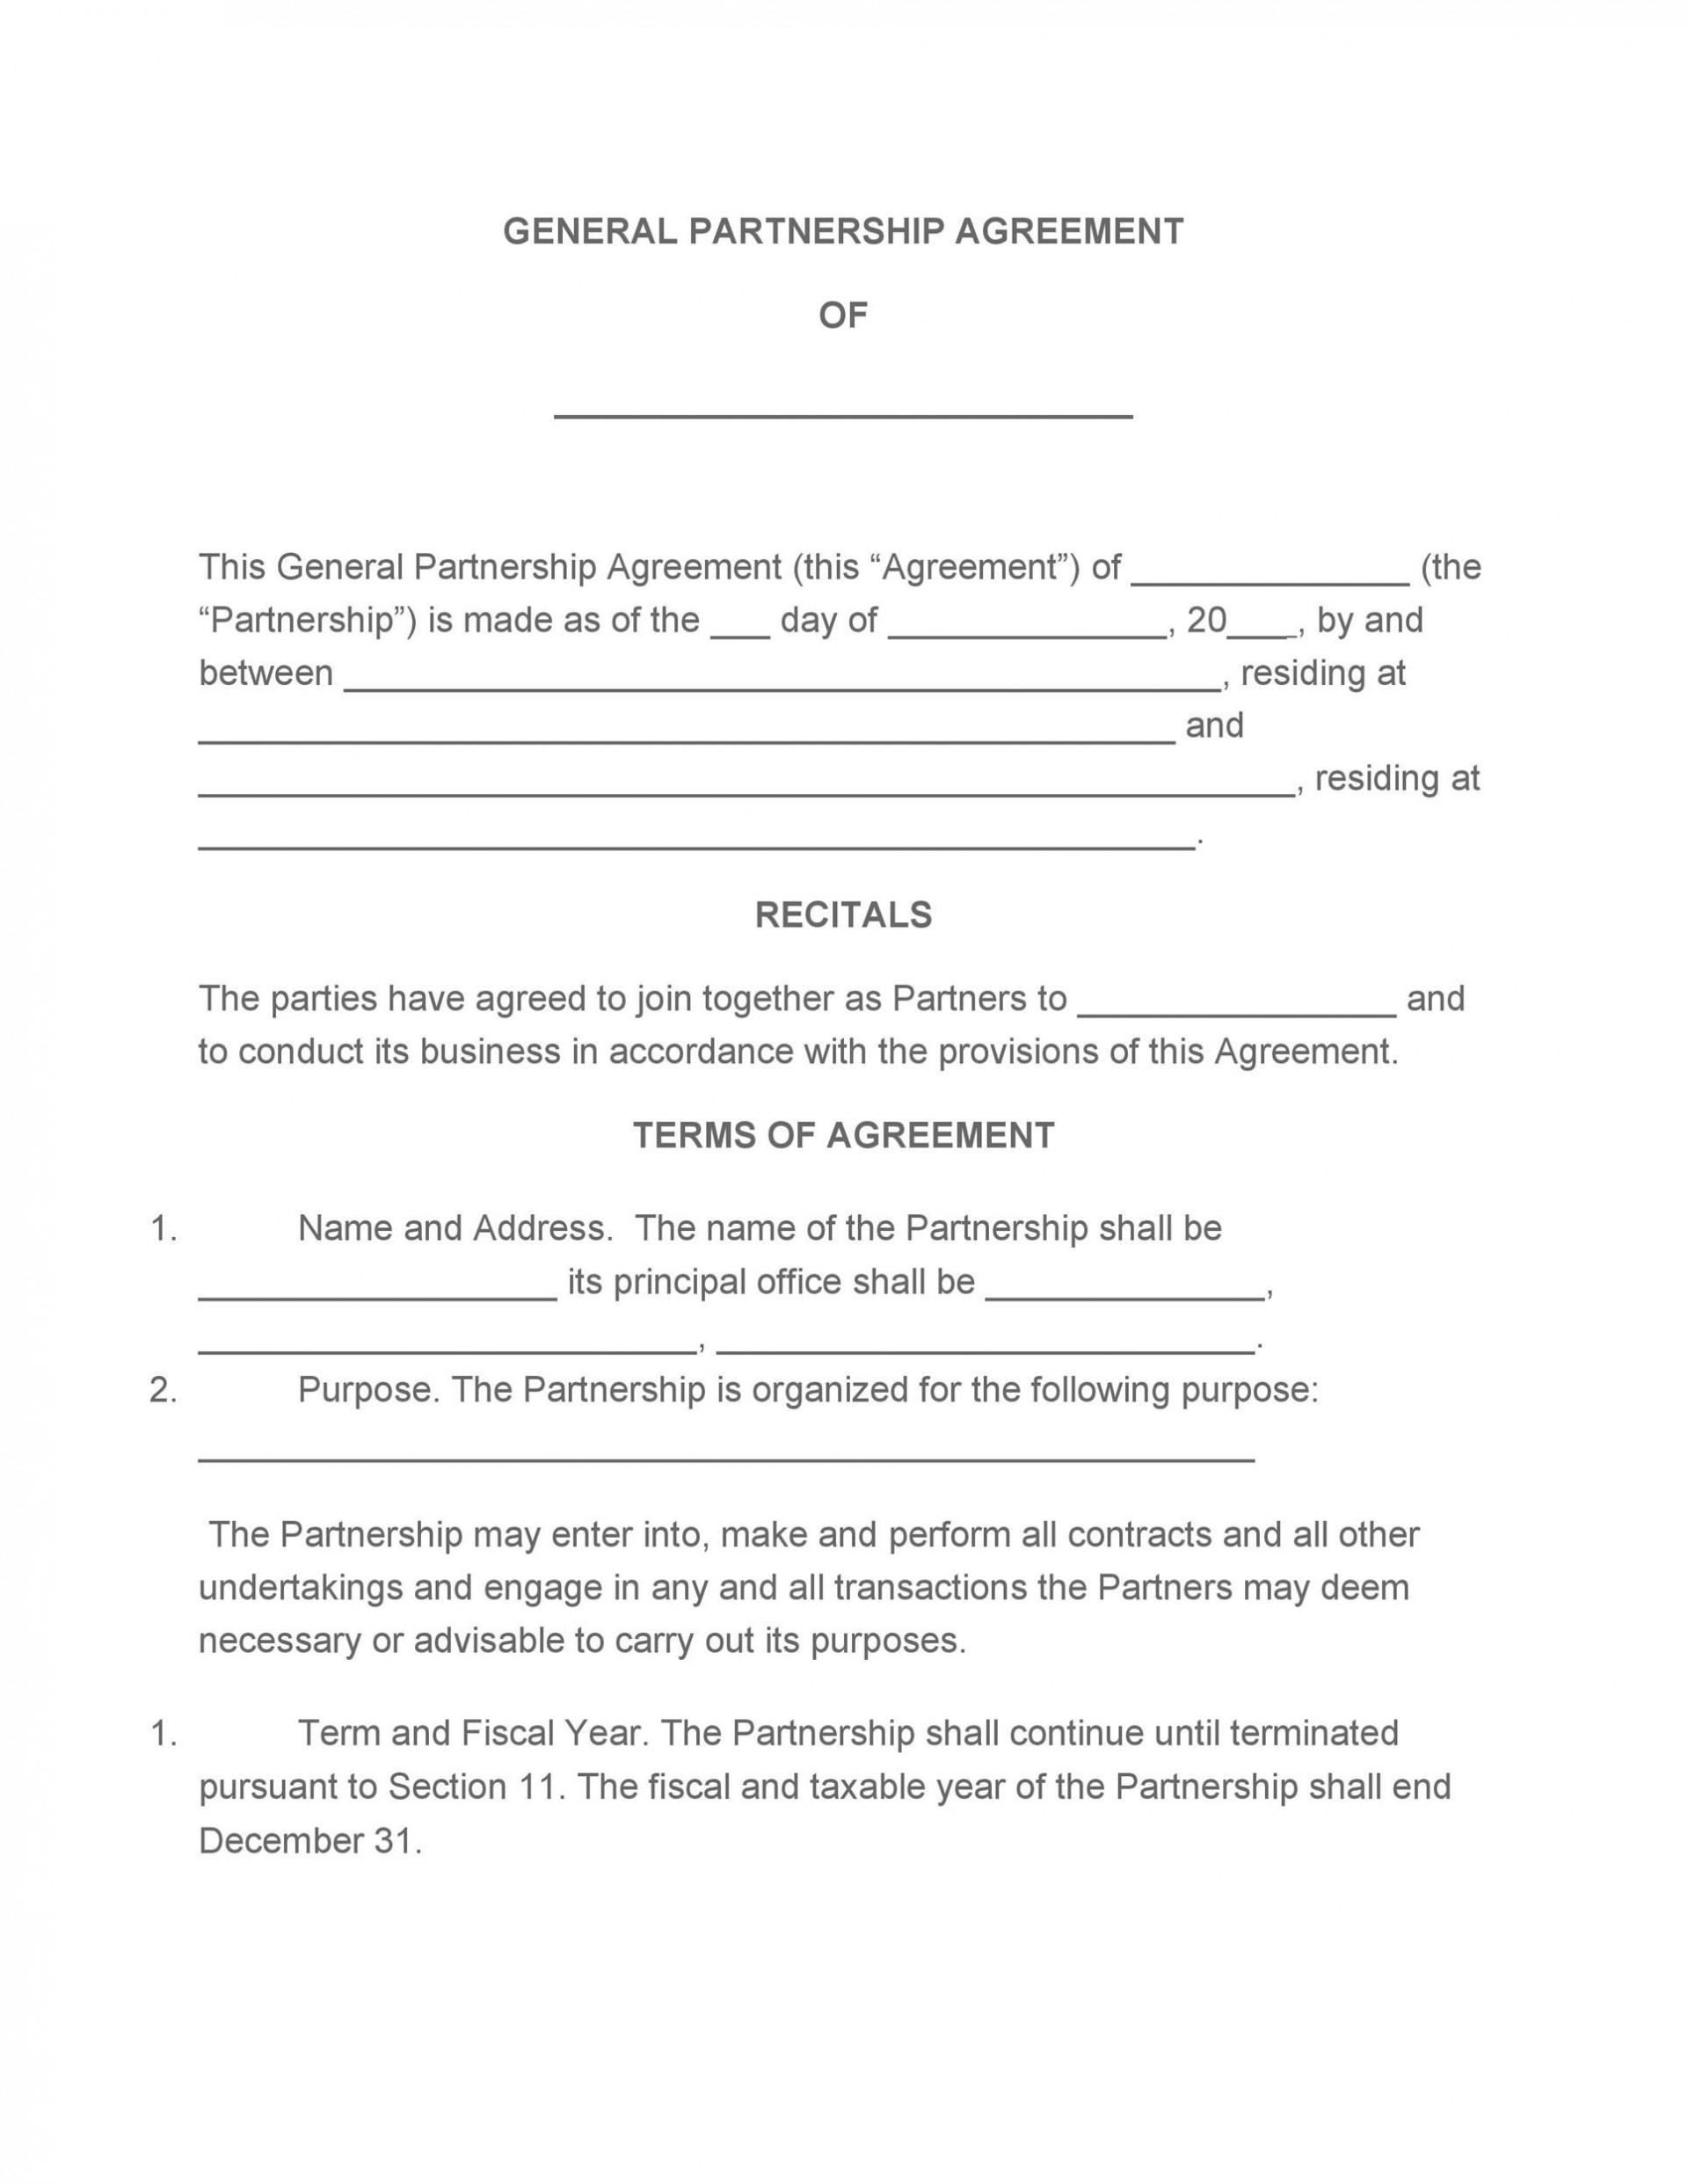 008 Unusual General Partnership Agreement Template Texa Design  Texas1920